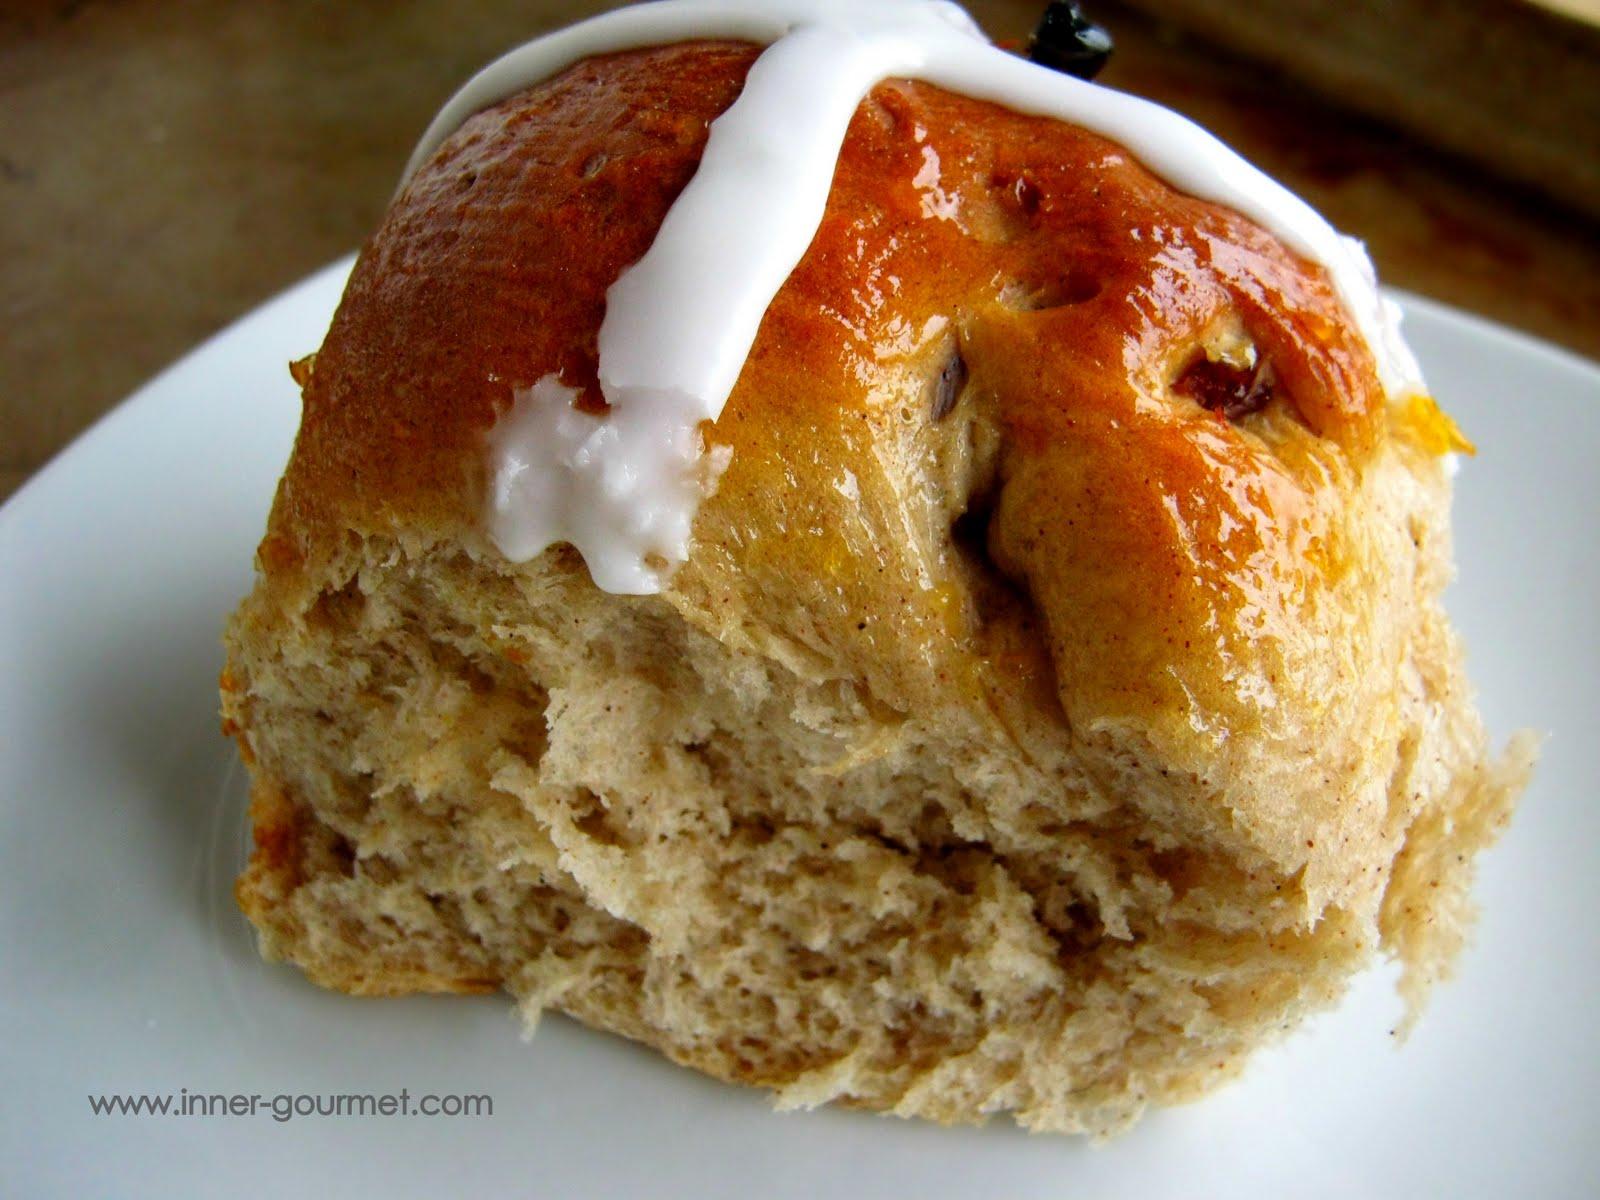 The Inner Gourmet: Cherry-Apricot Hot Cross Buns